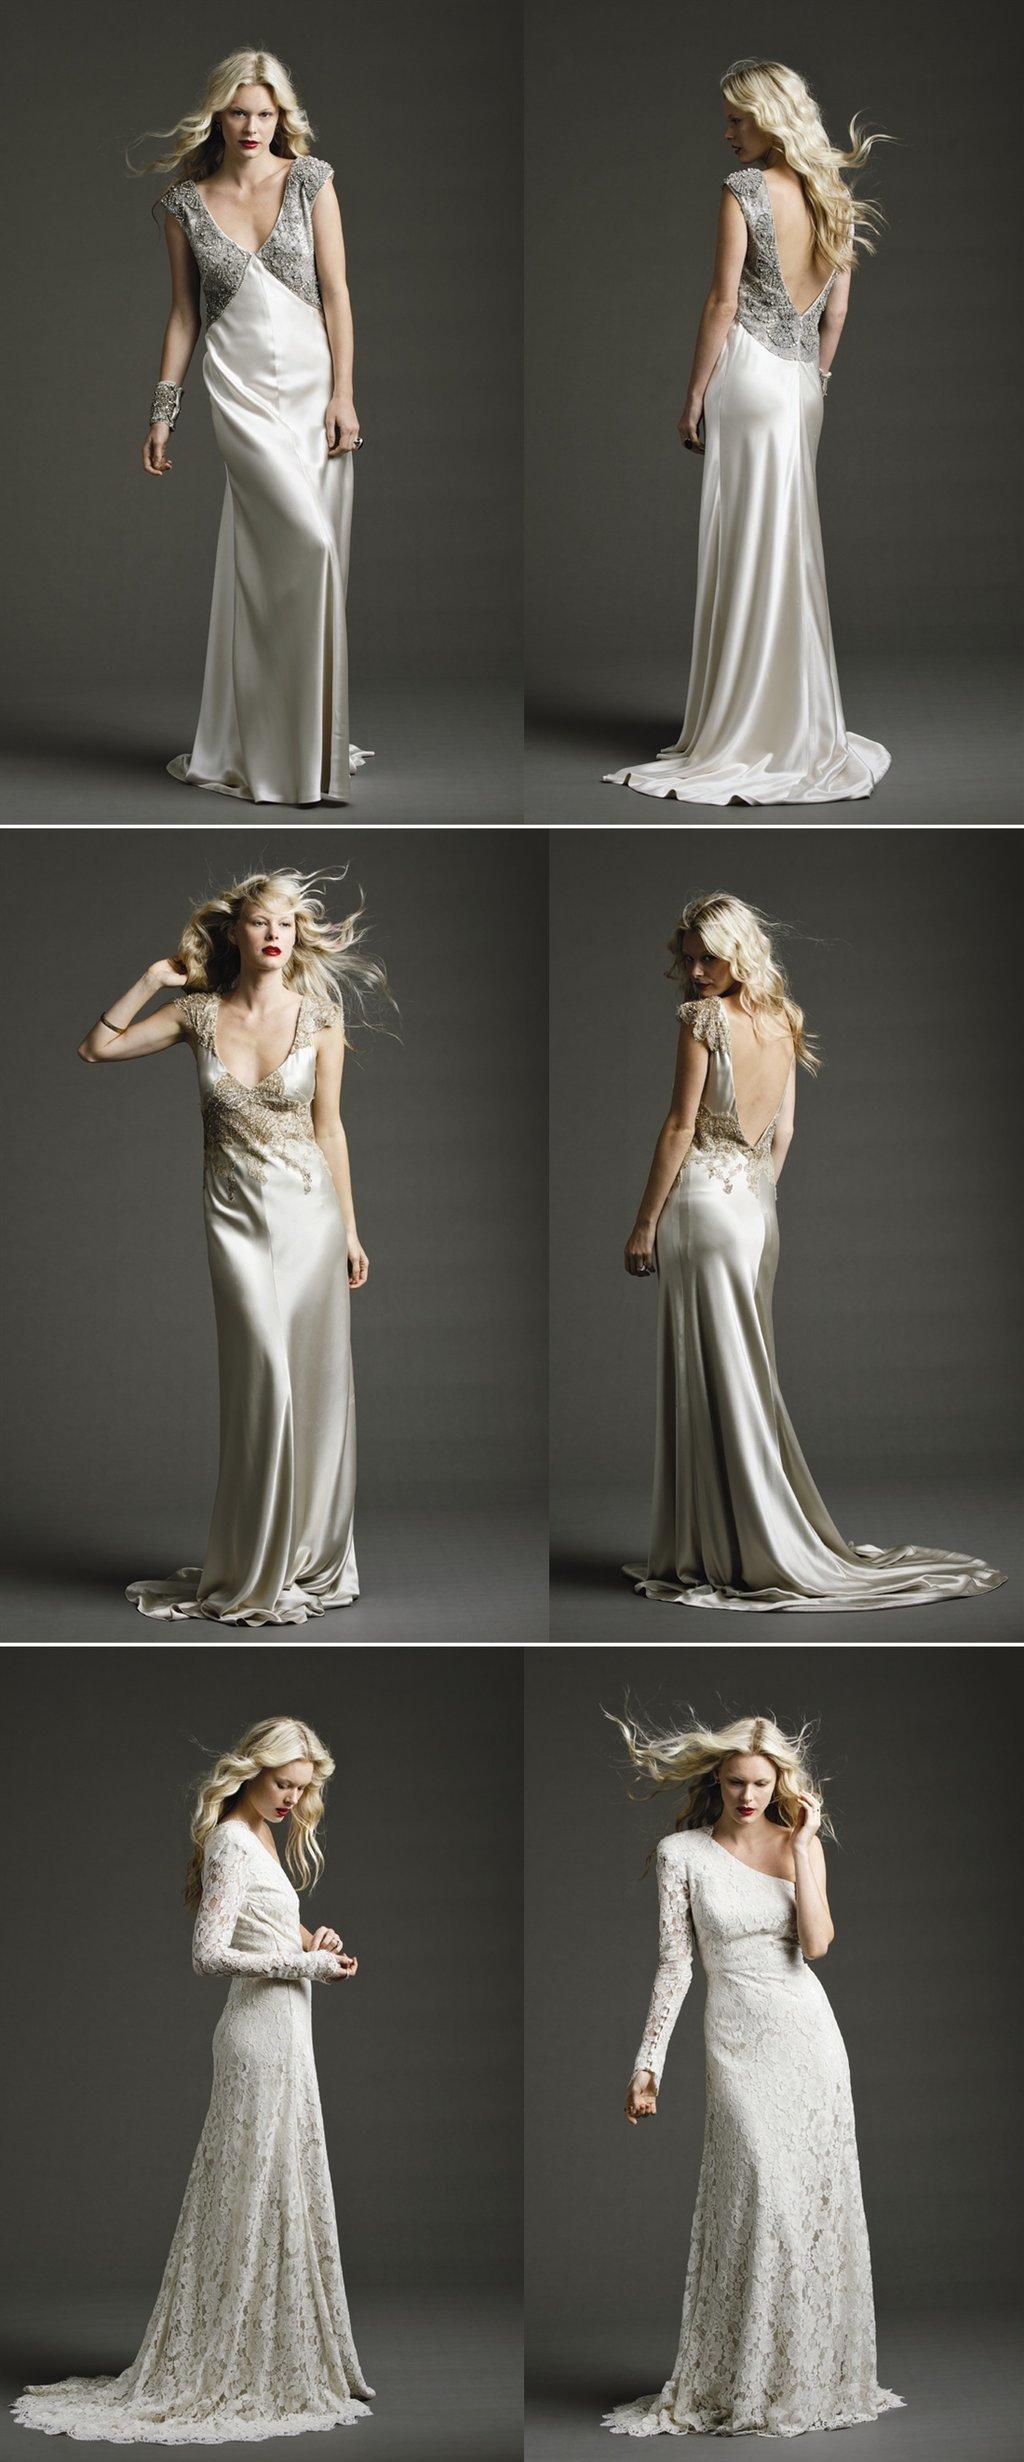 Vintage-inspired-wedding-style-2012-wedding-dresses.full